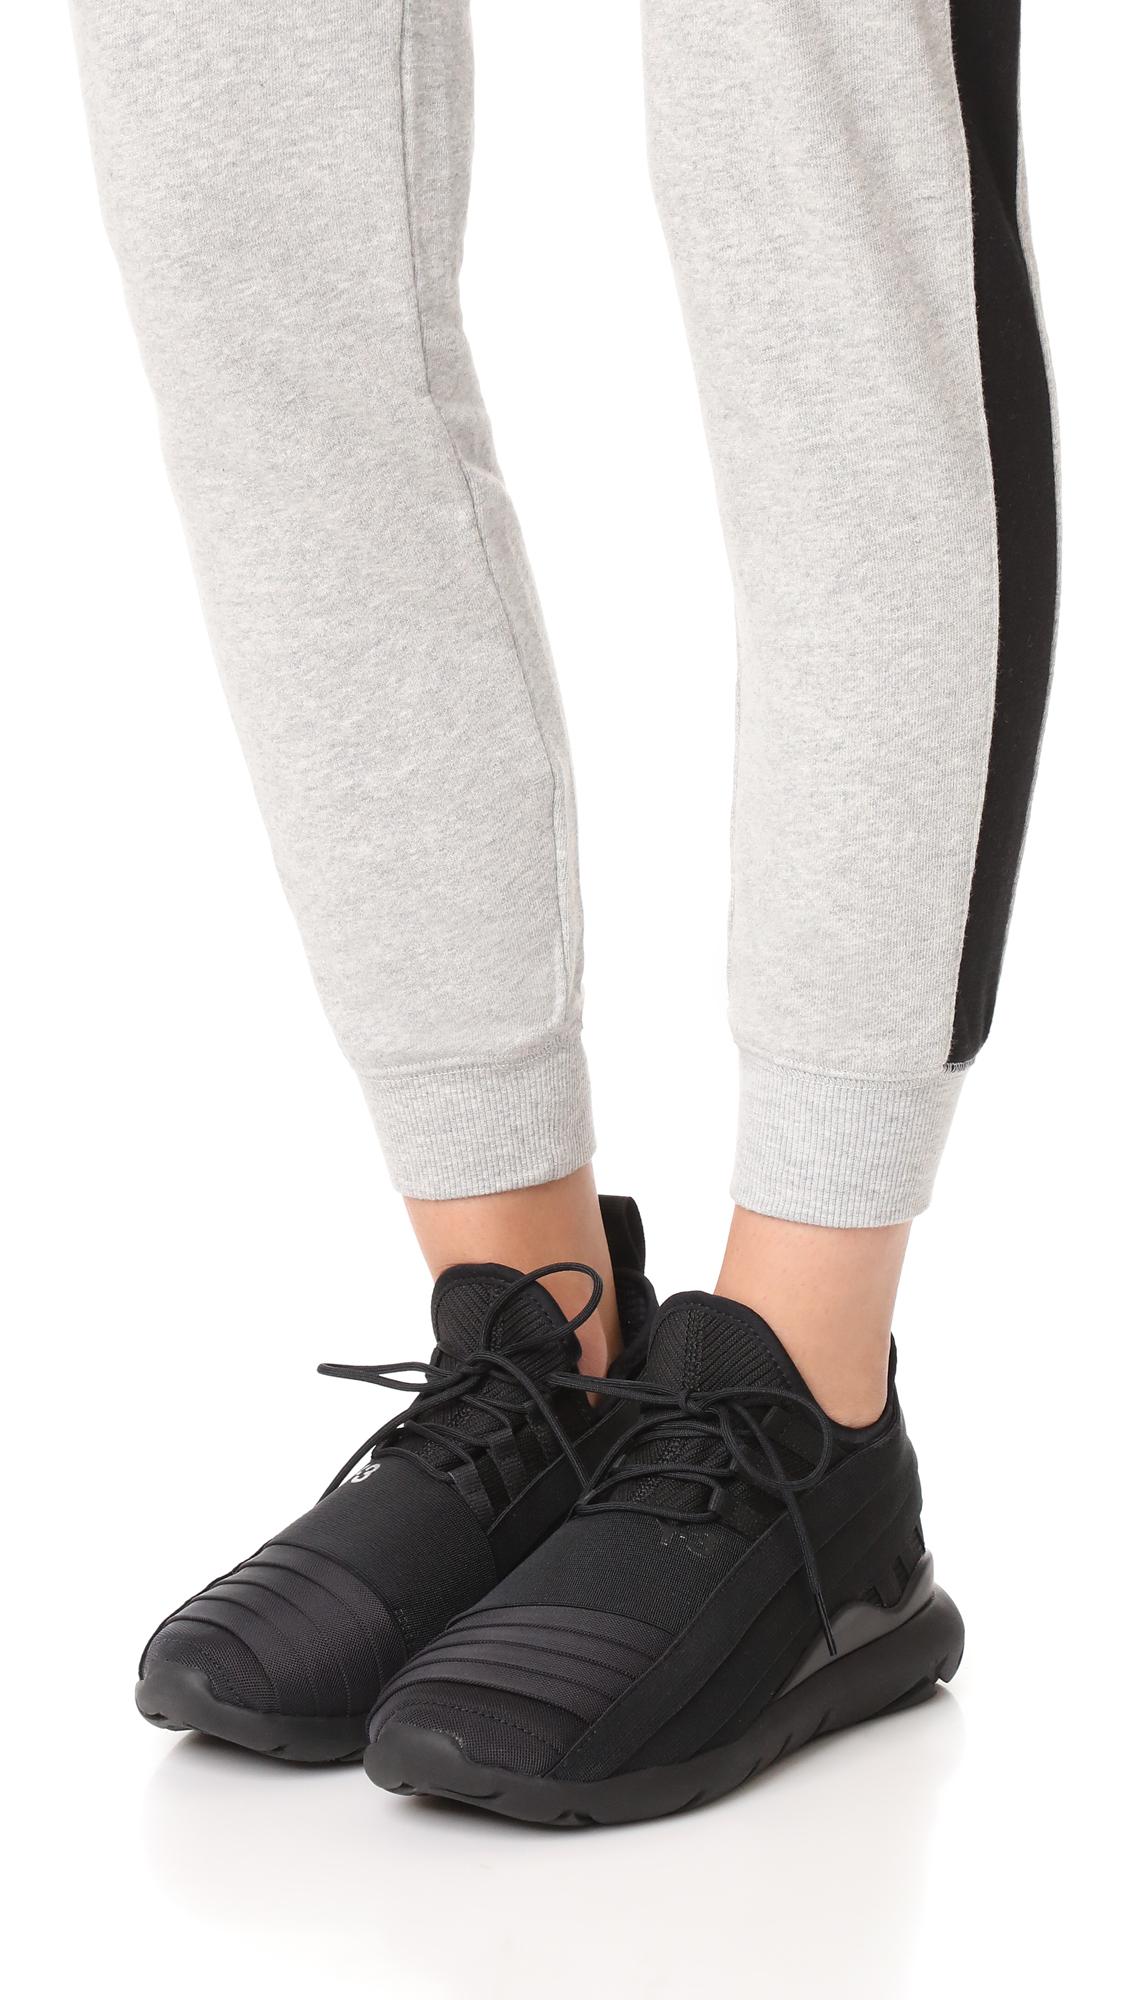 88a588936ccc7 Y-3 Y-3 Qasa Elle Lace Sneakers 2.0